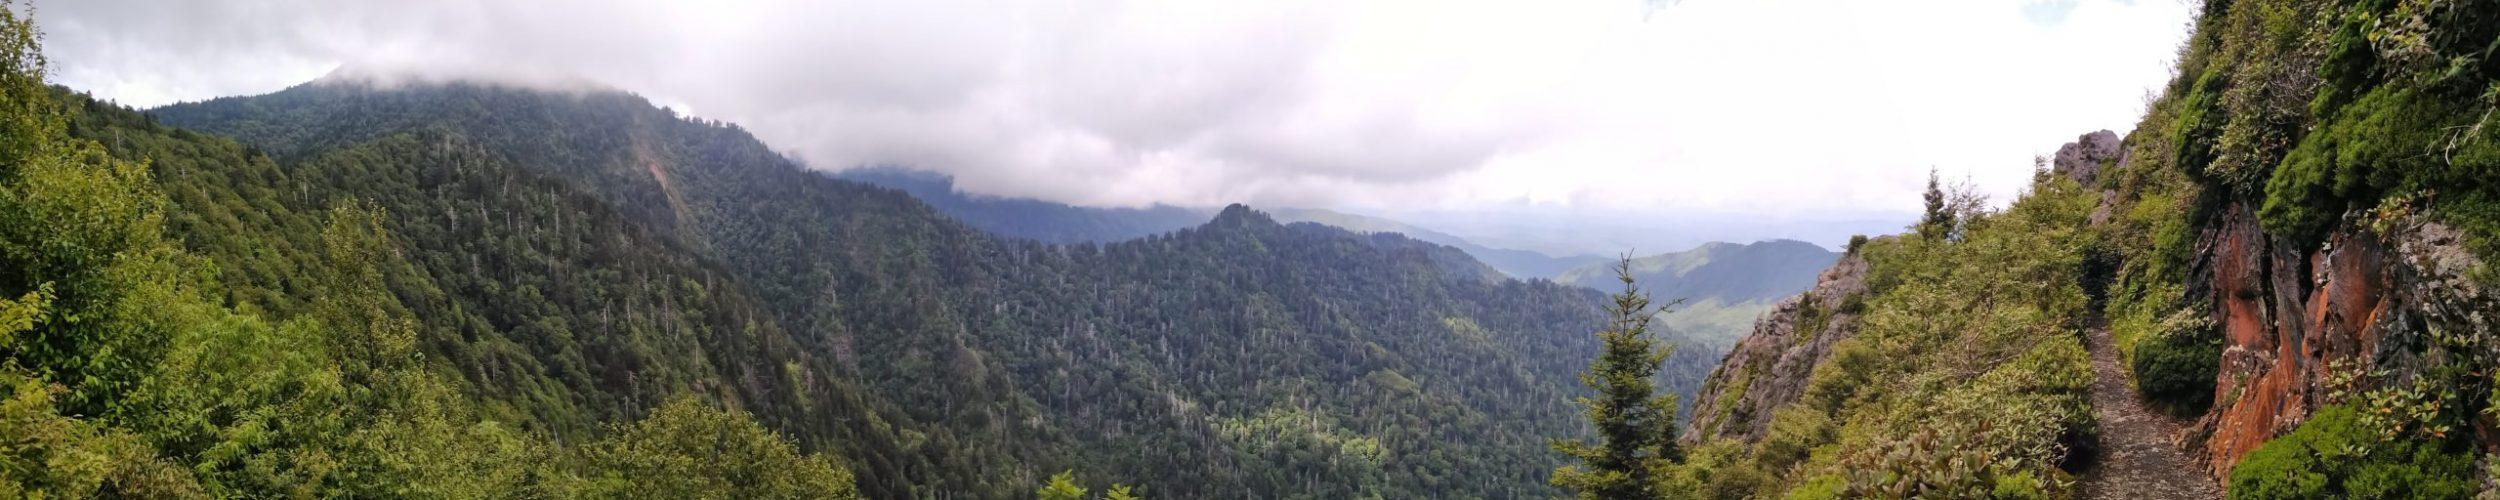 Panorama_Mountains